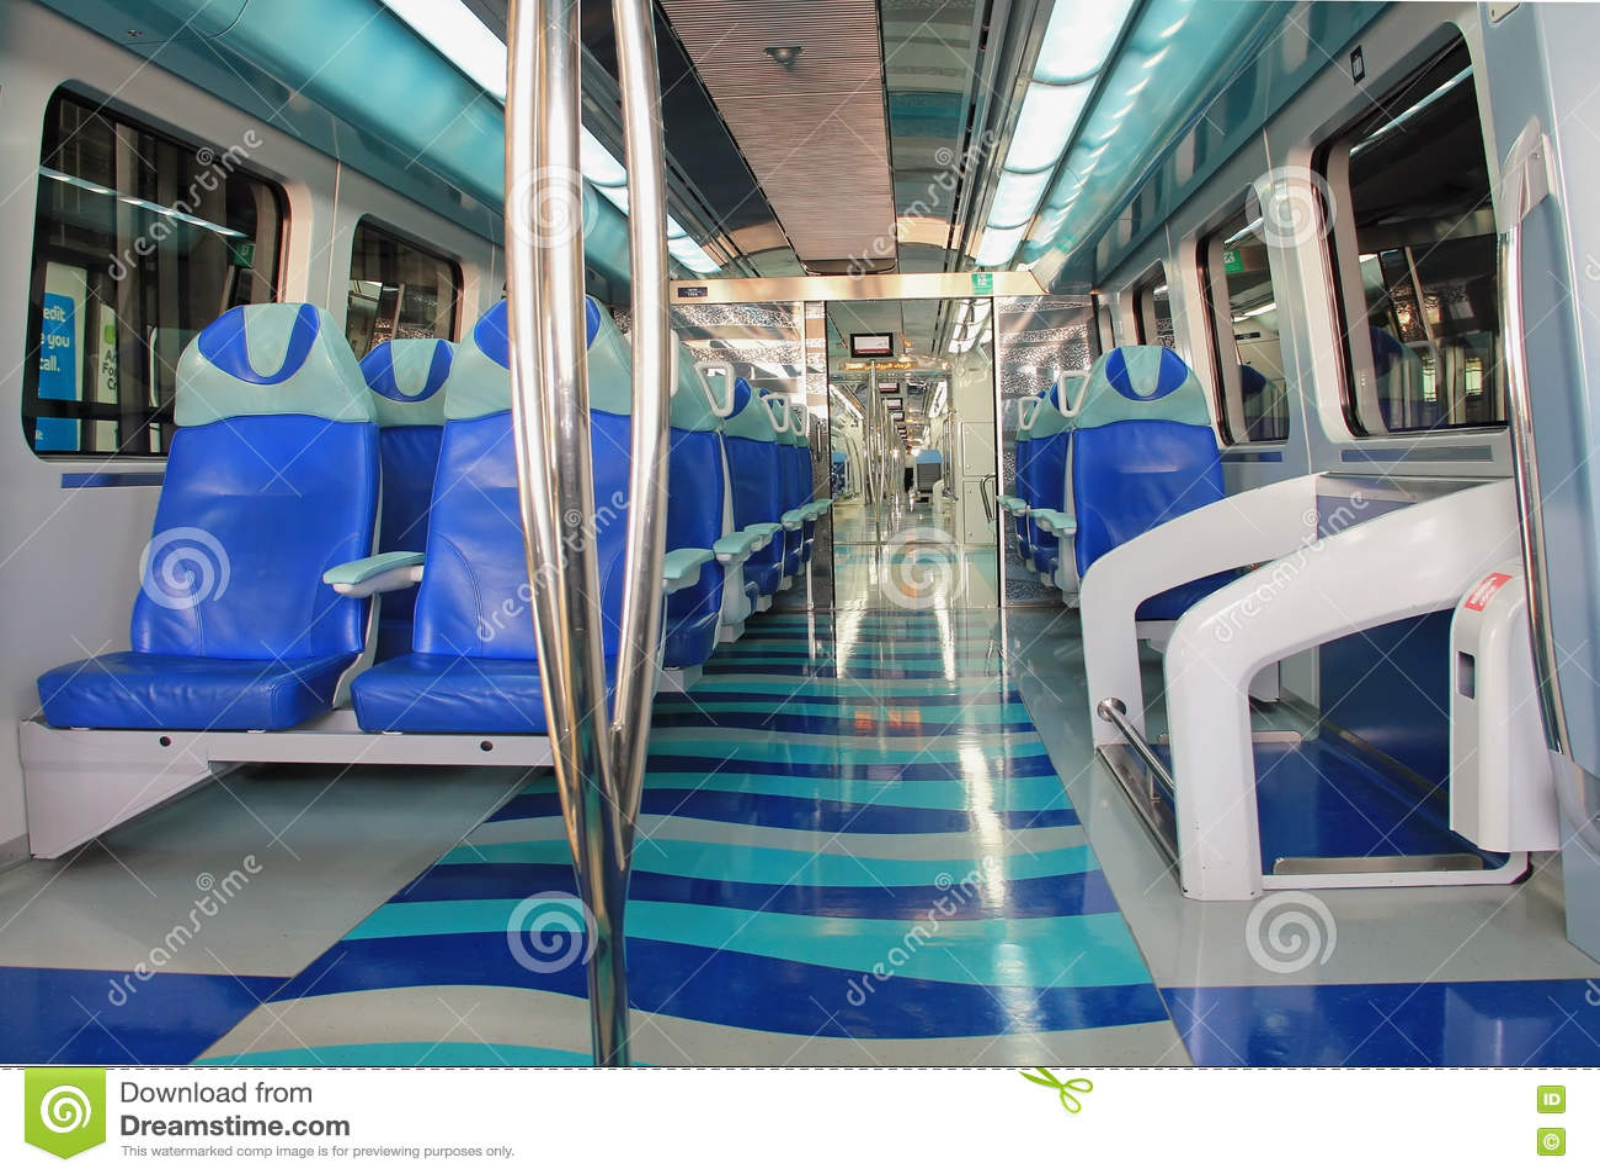 inside of an empty passenger train car stock image 22954819. Black Bedroom Furniture Sets. Home Design Ideas